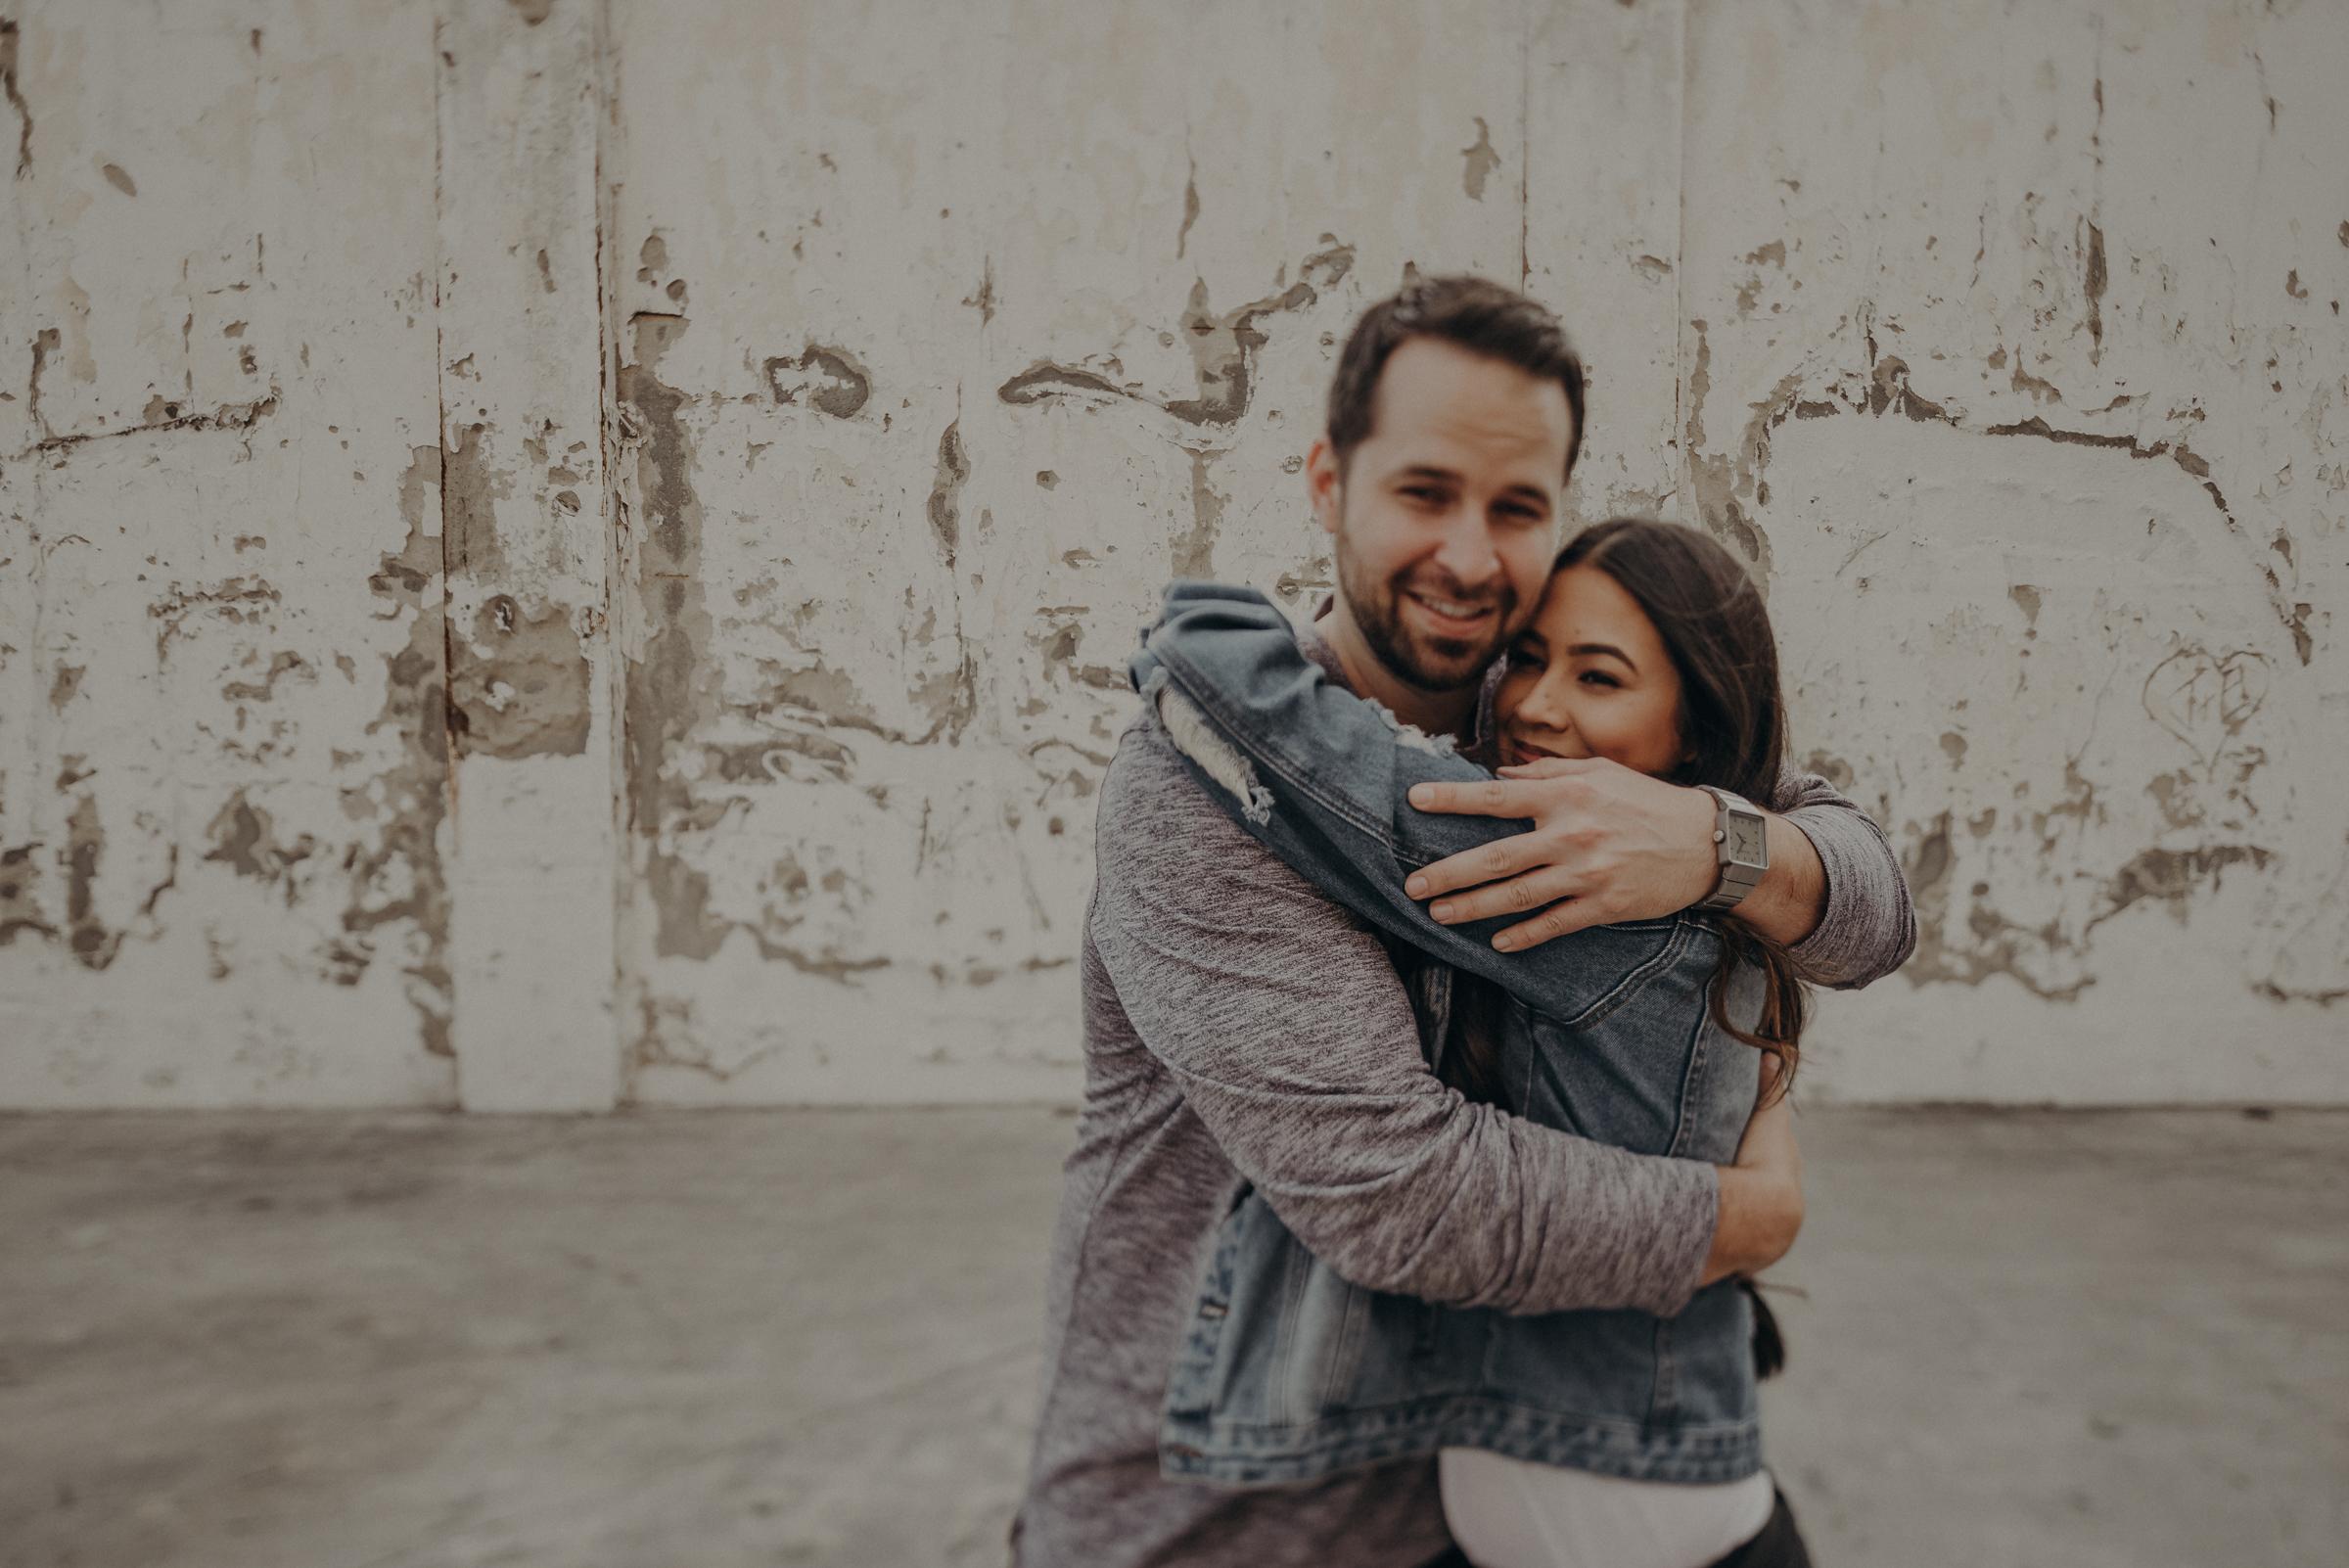 Isaiah + Taylor Photography - Los Angeles Wedding Photographer - Long Beach Engagement-036.jpg